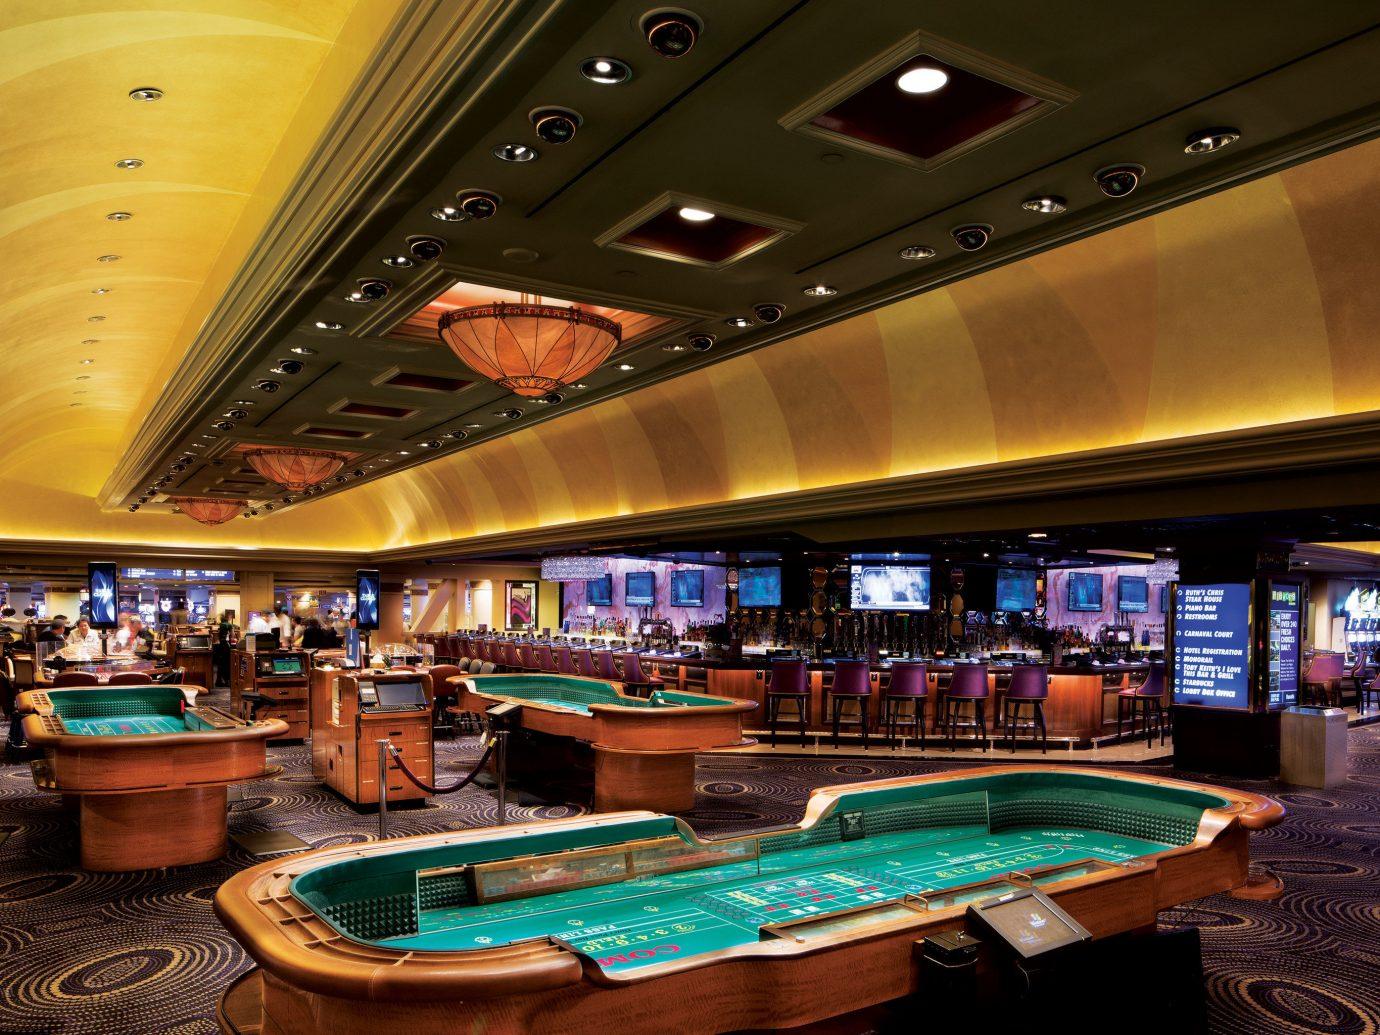 Budget ceiling indoor recreation room billiard room Casino interior design vehicle games several